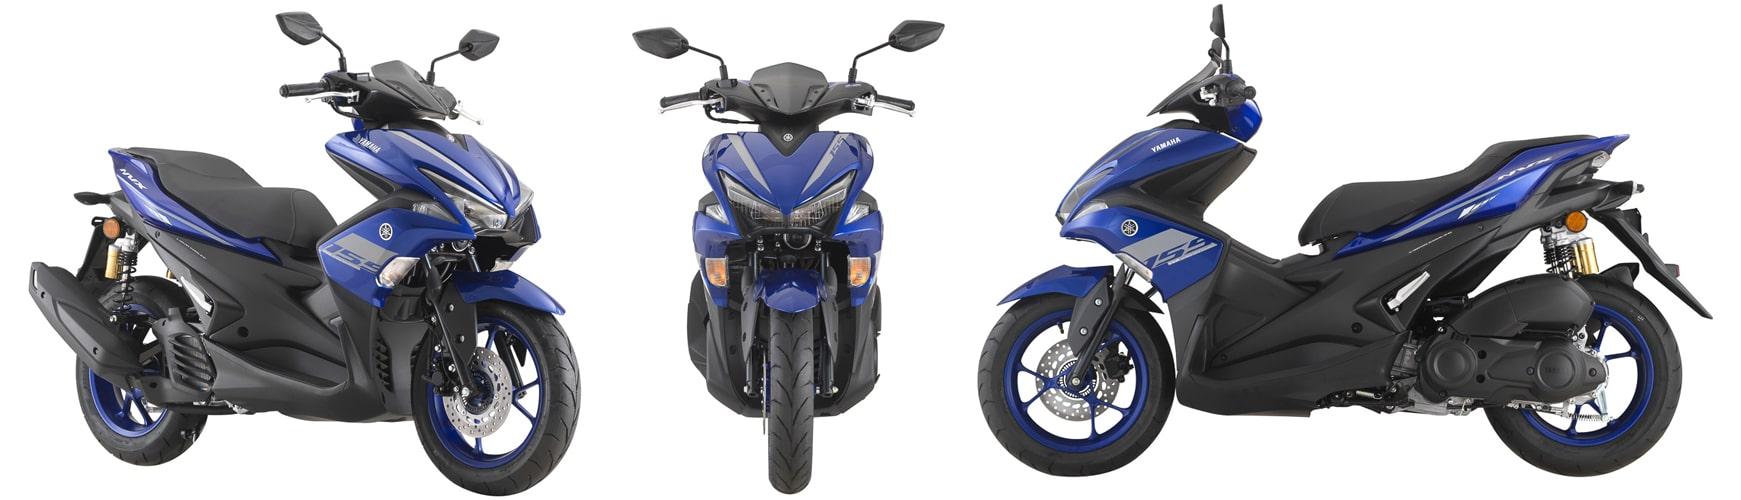 NVX 2020 สีน้ำเงิน